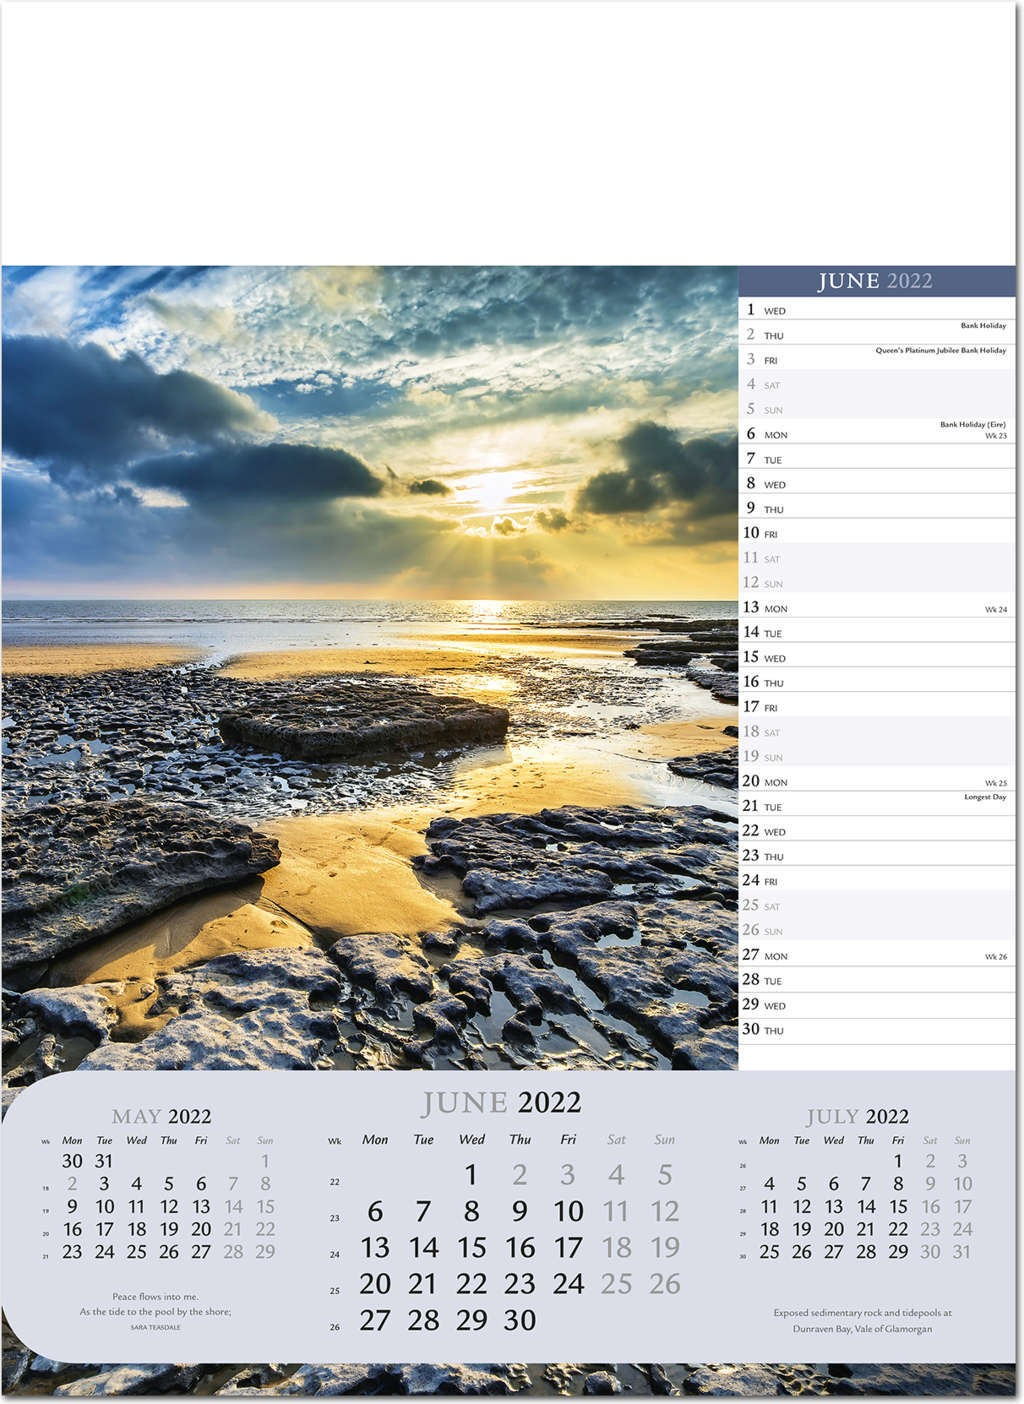 Usps Calendar 2022.Moods Of Nature Calendar 2022 Rose Calendars